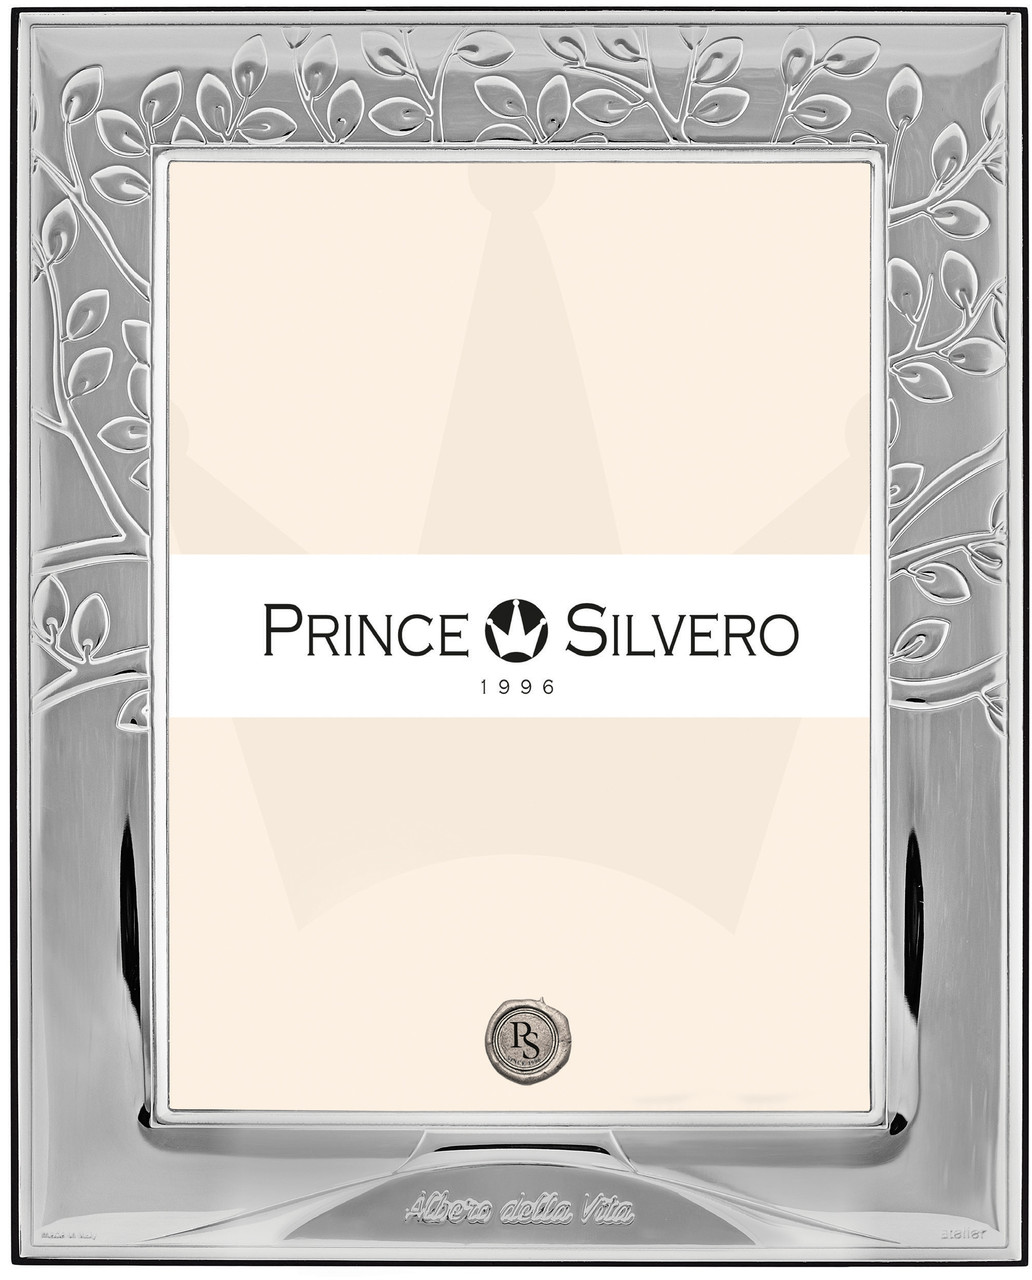 Серебряная рамка с узорами 20Χ25 для фото Prince Silvreo